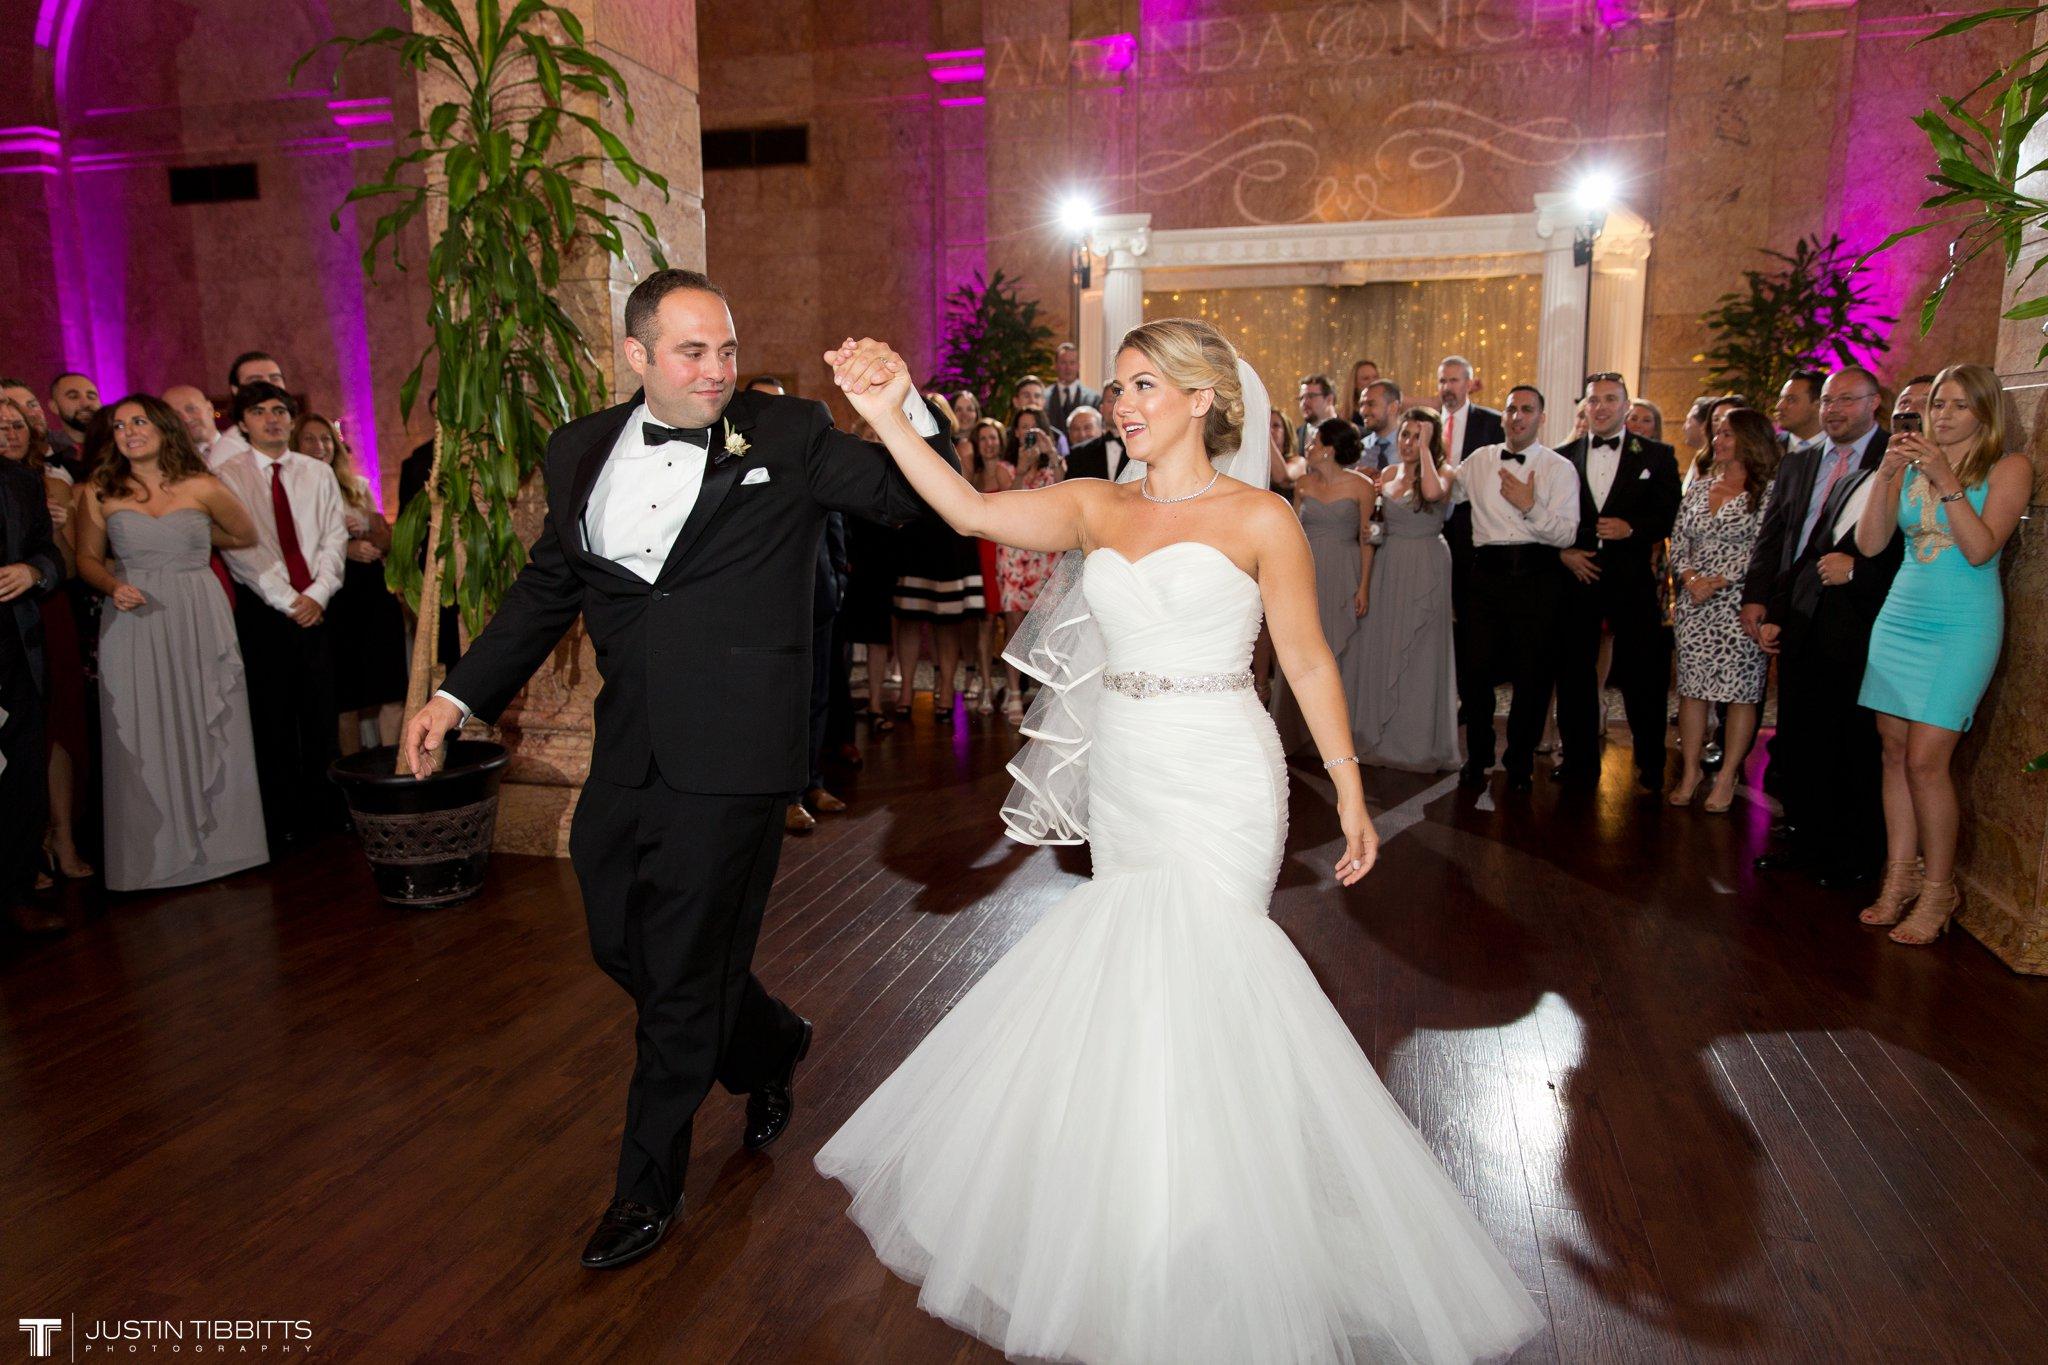 state-room-wedding-photos-with-amanda-and-nick_0157